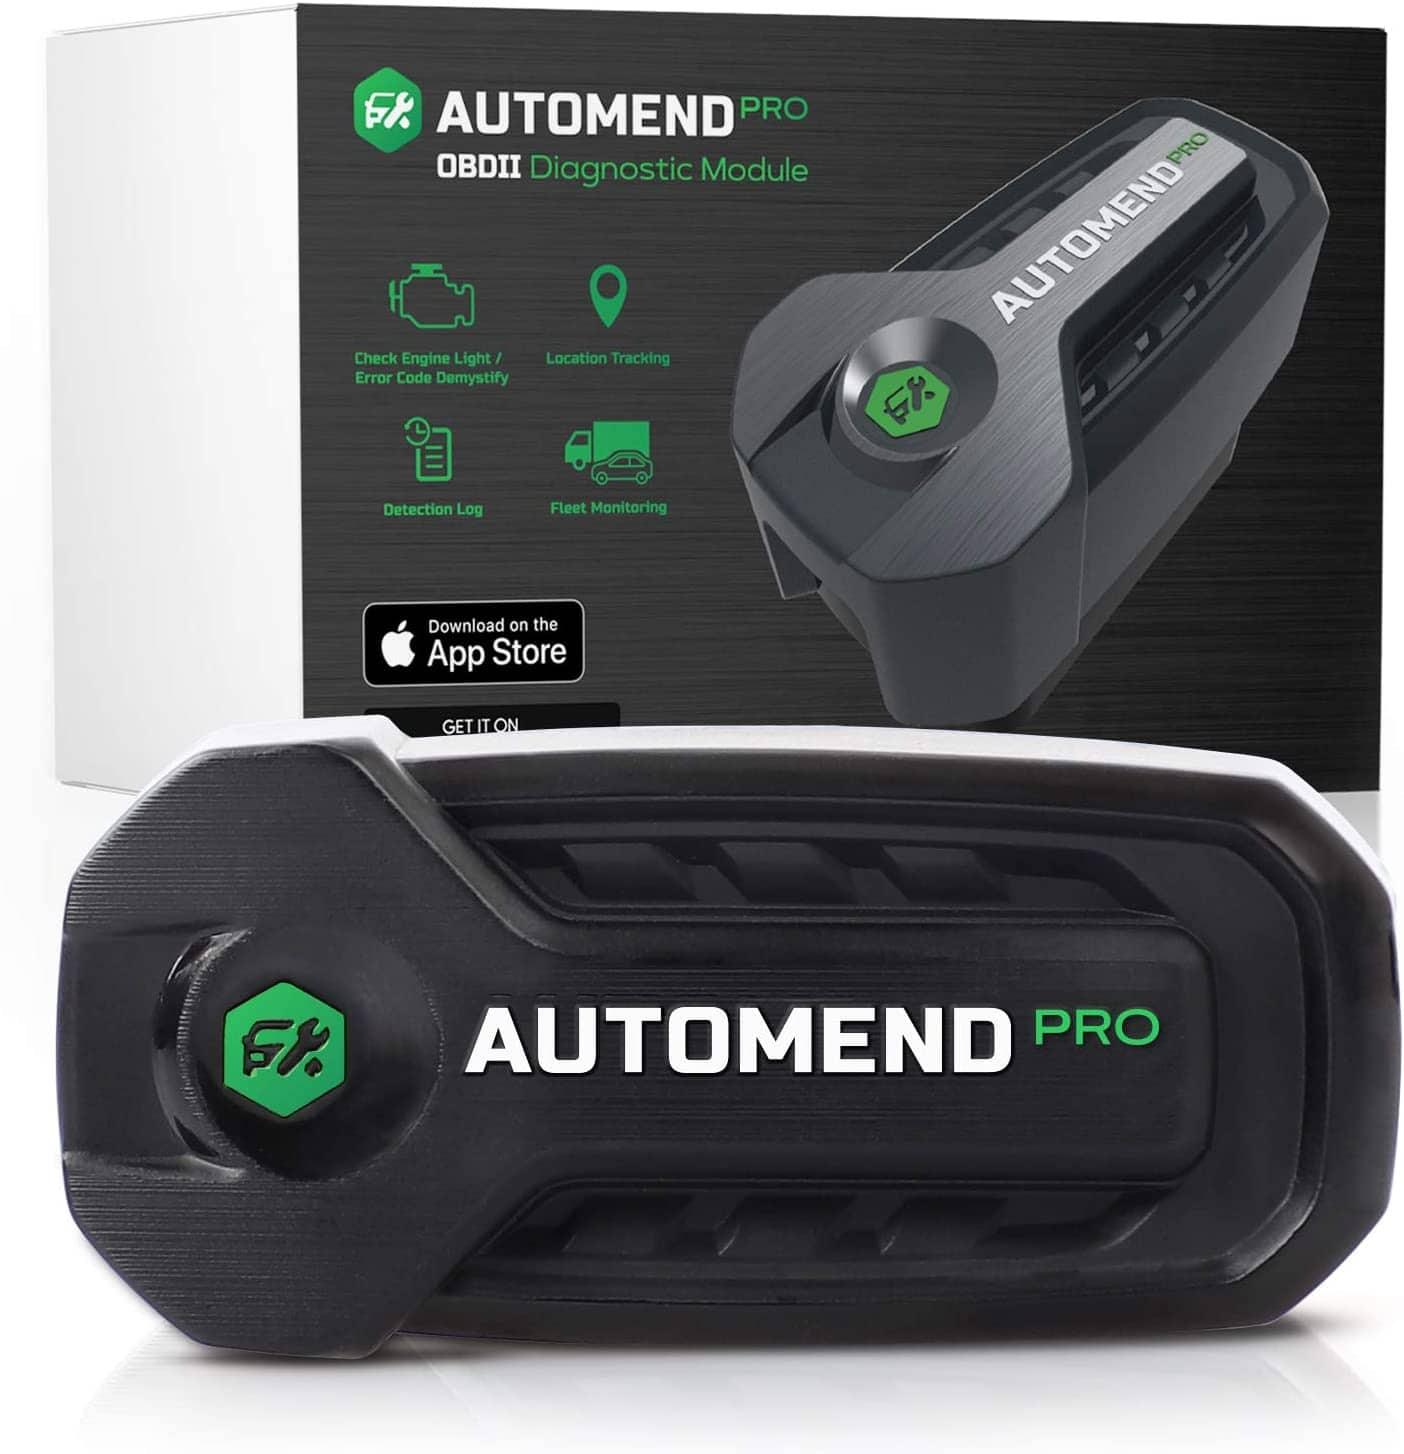 AutoMend Pro diagnostic tool